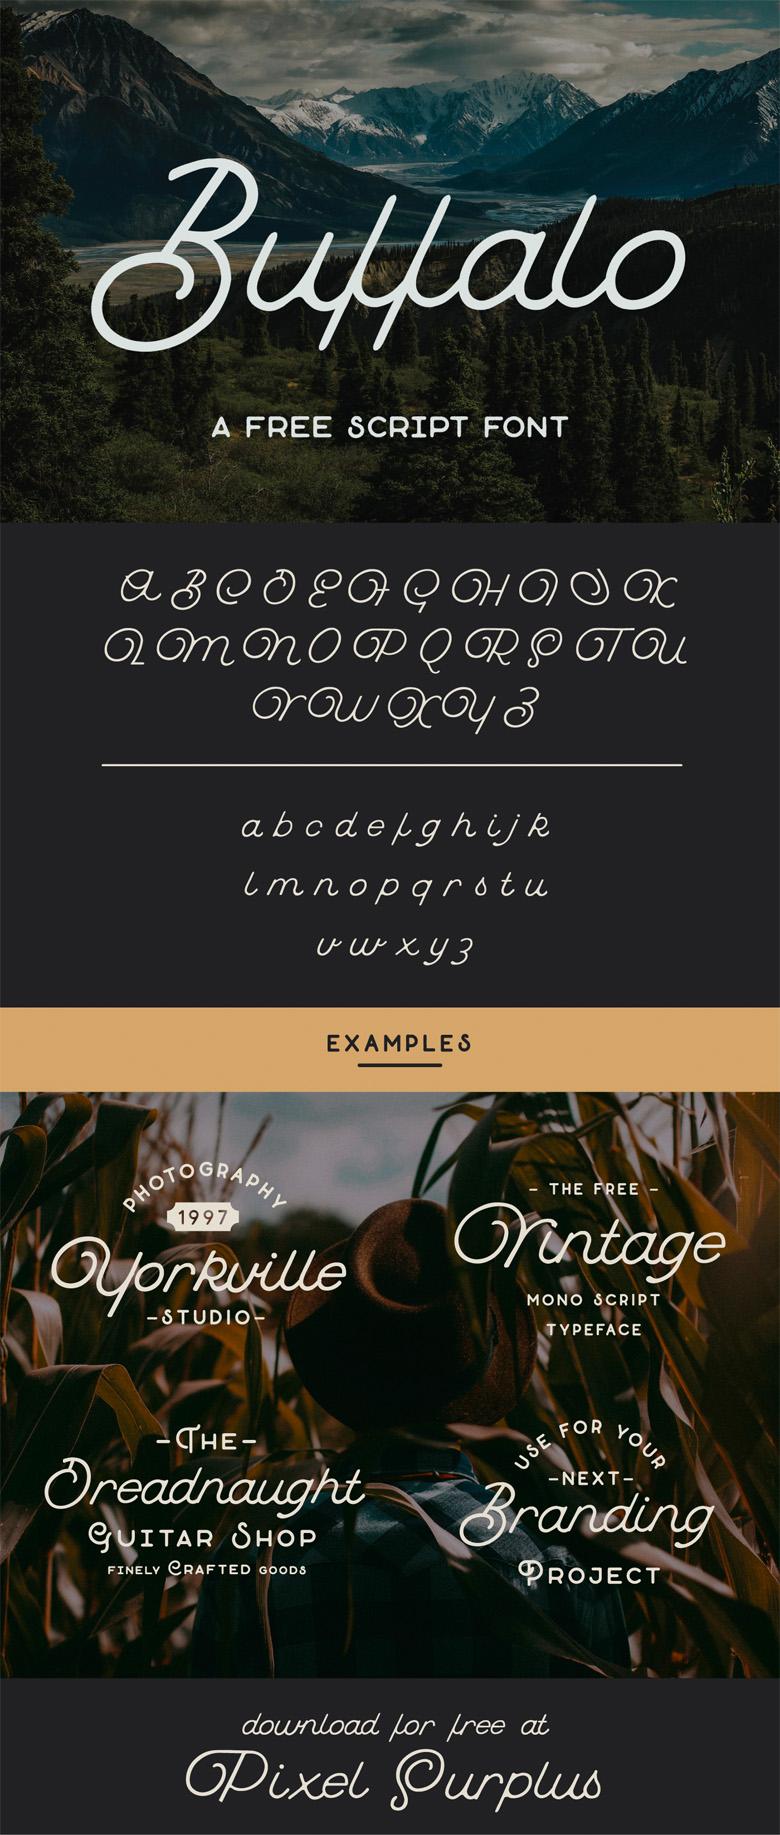 Beautiful free fonts for designers - Buffalo